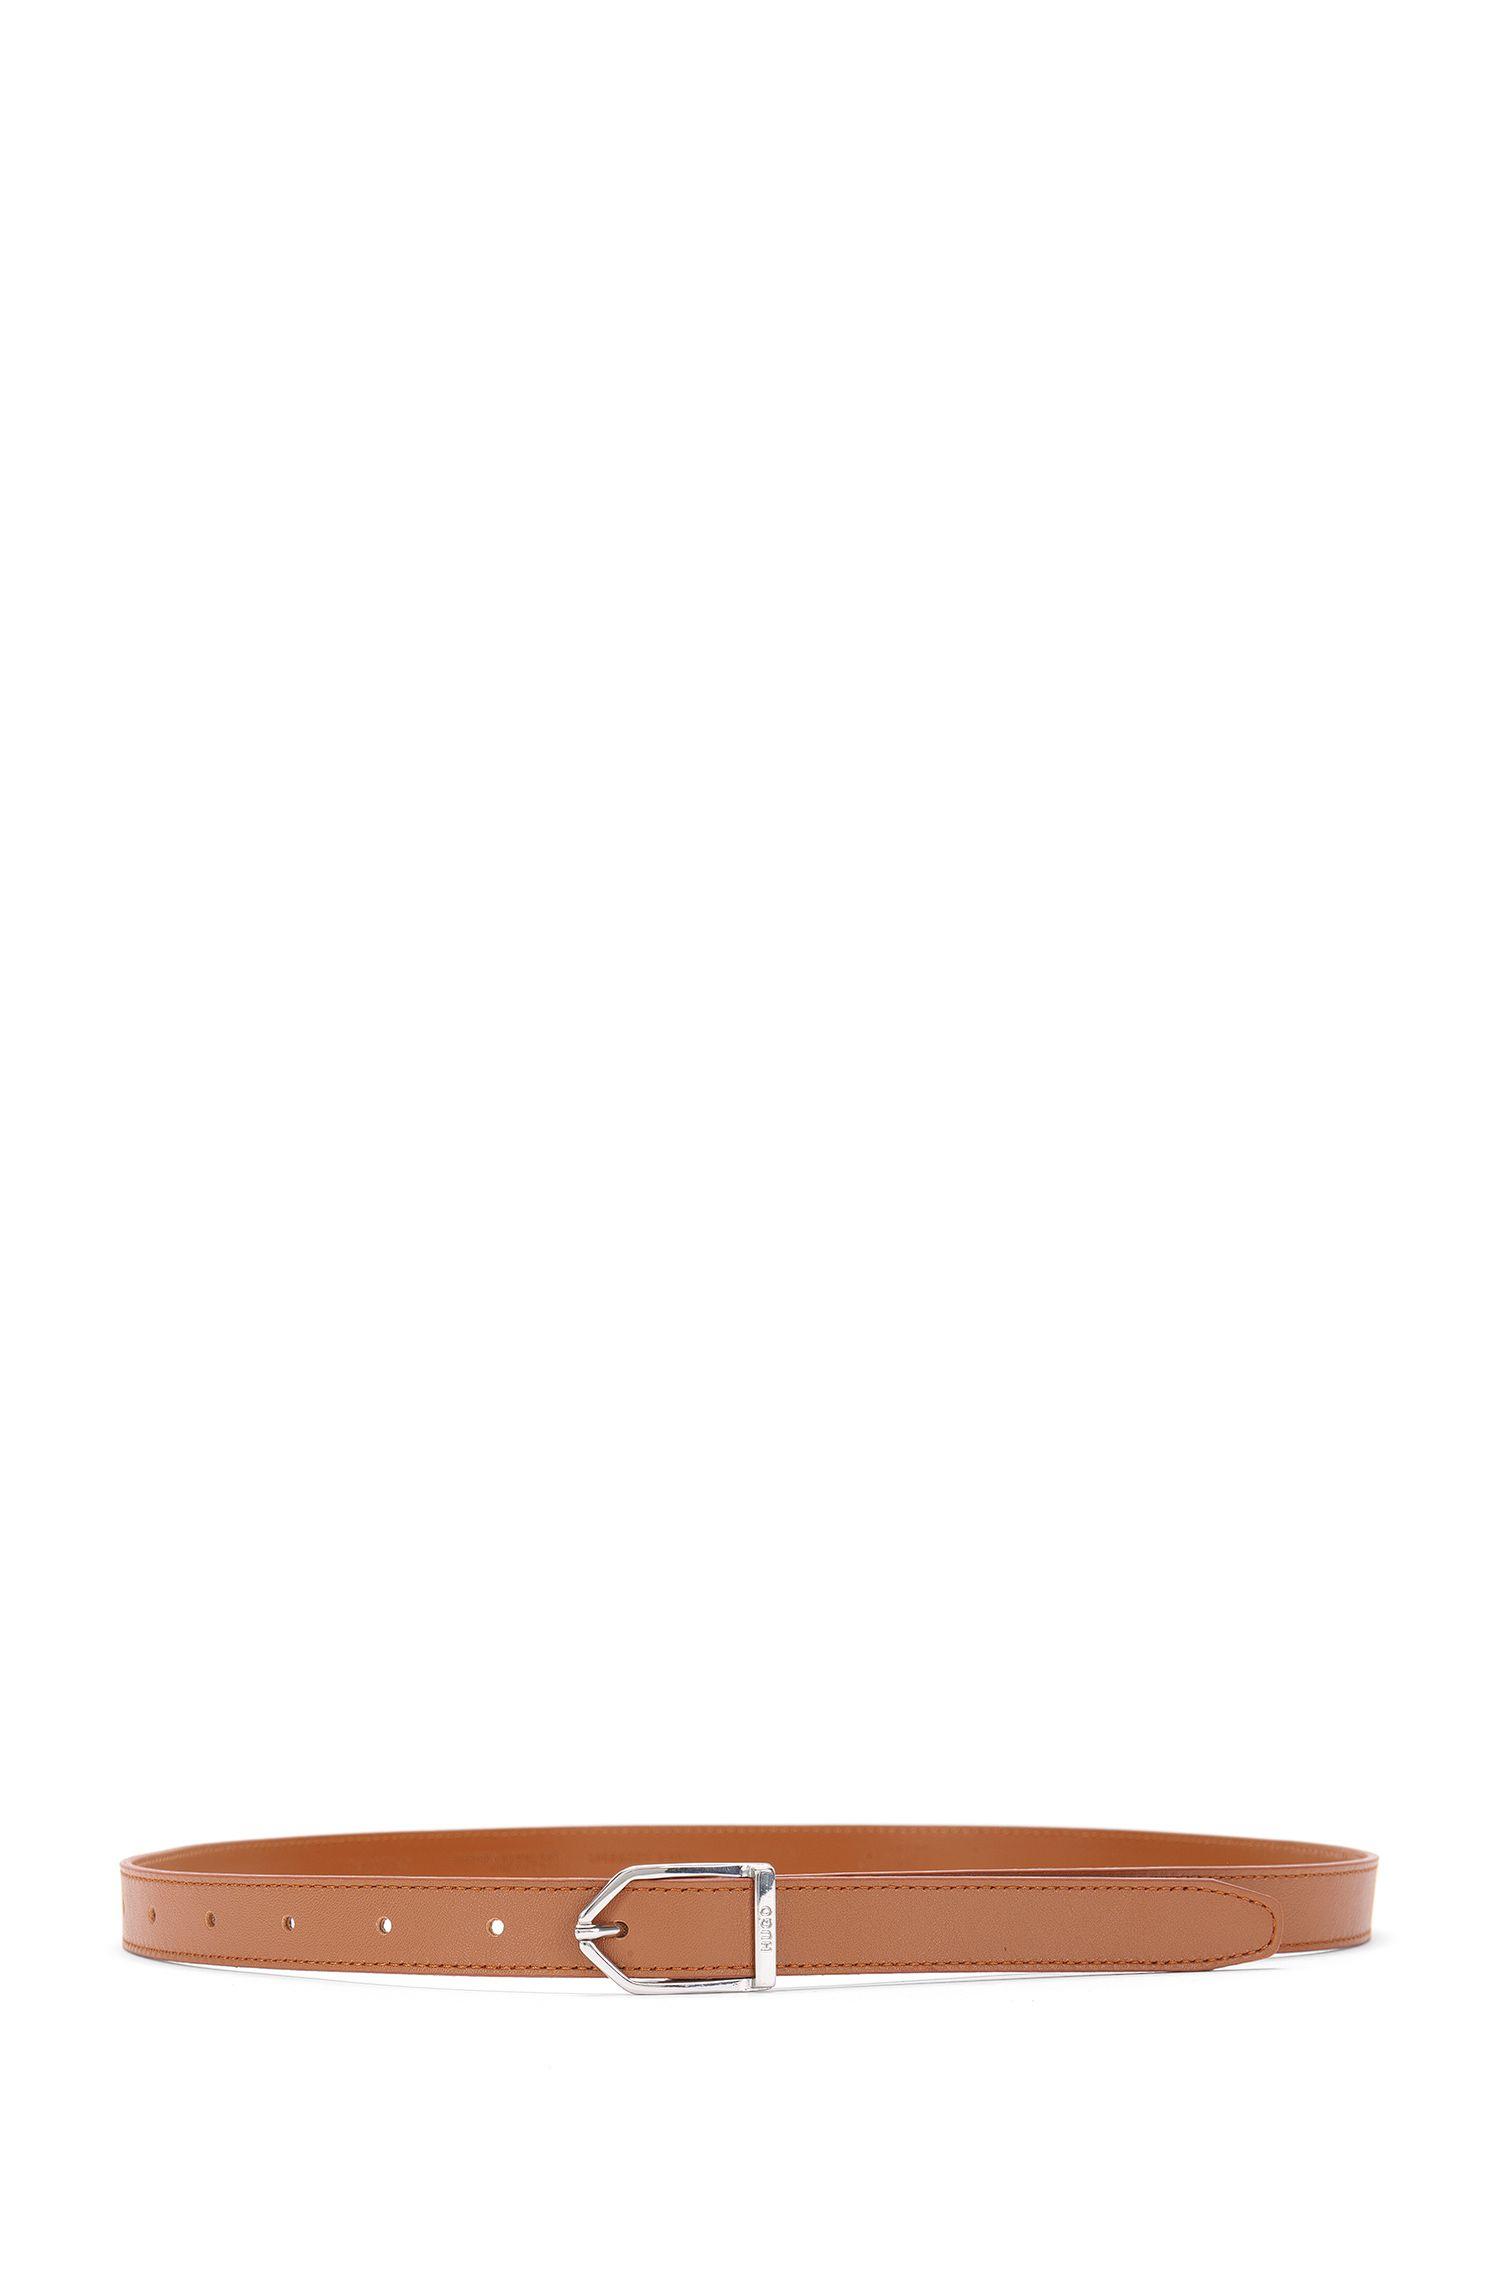 Schmaler Ledergürtel mit moderner Schließe